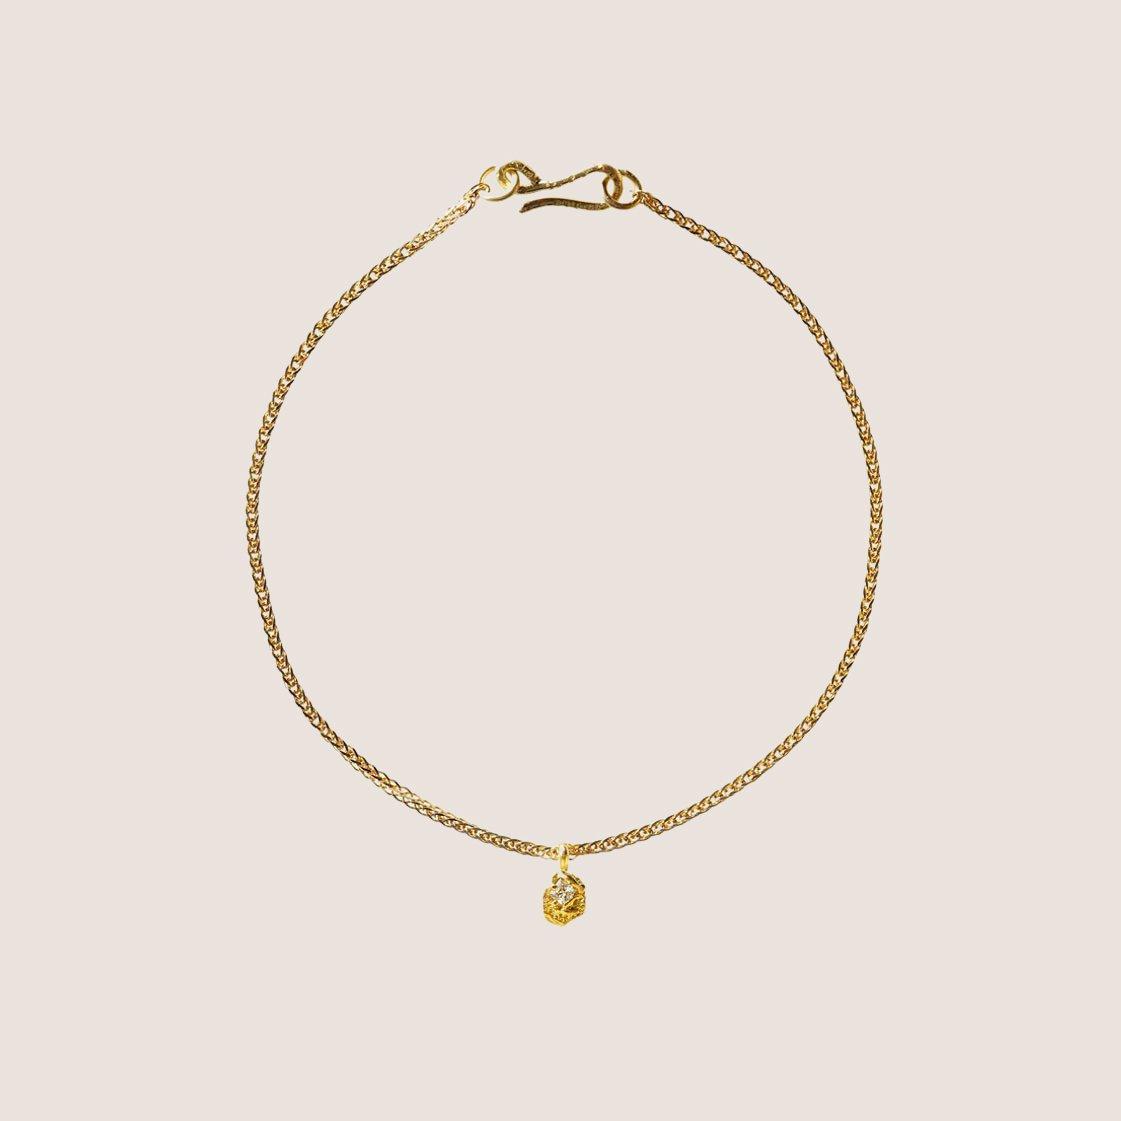 Roxy Finest Bliss Bracelet